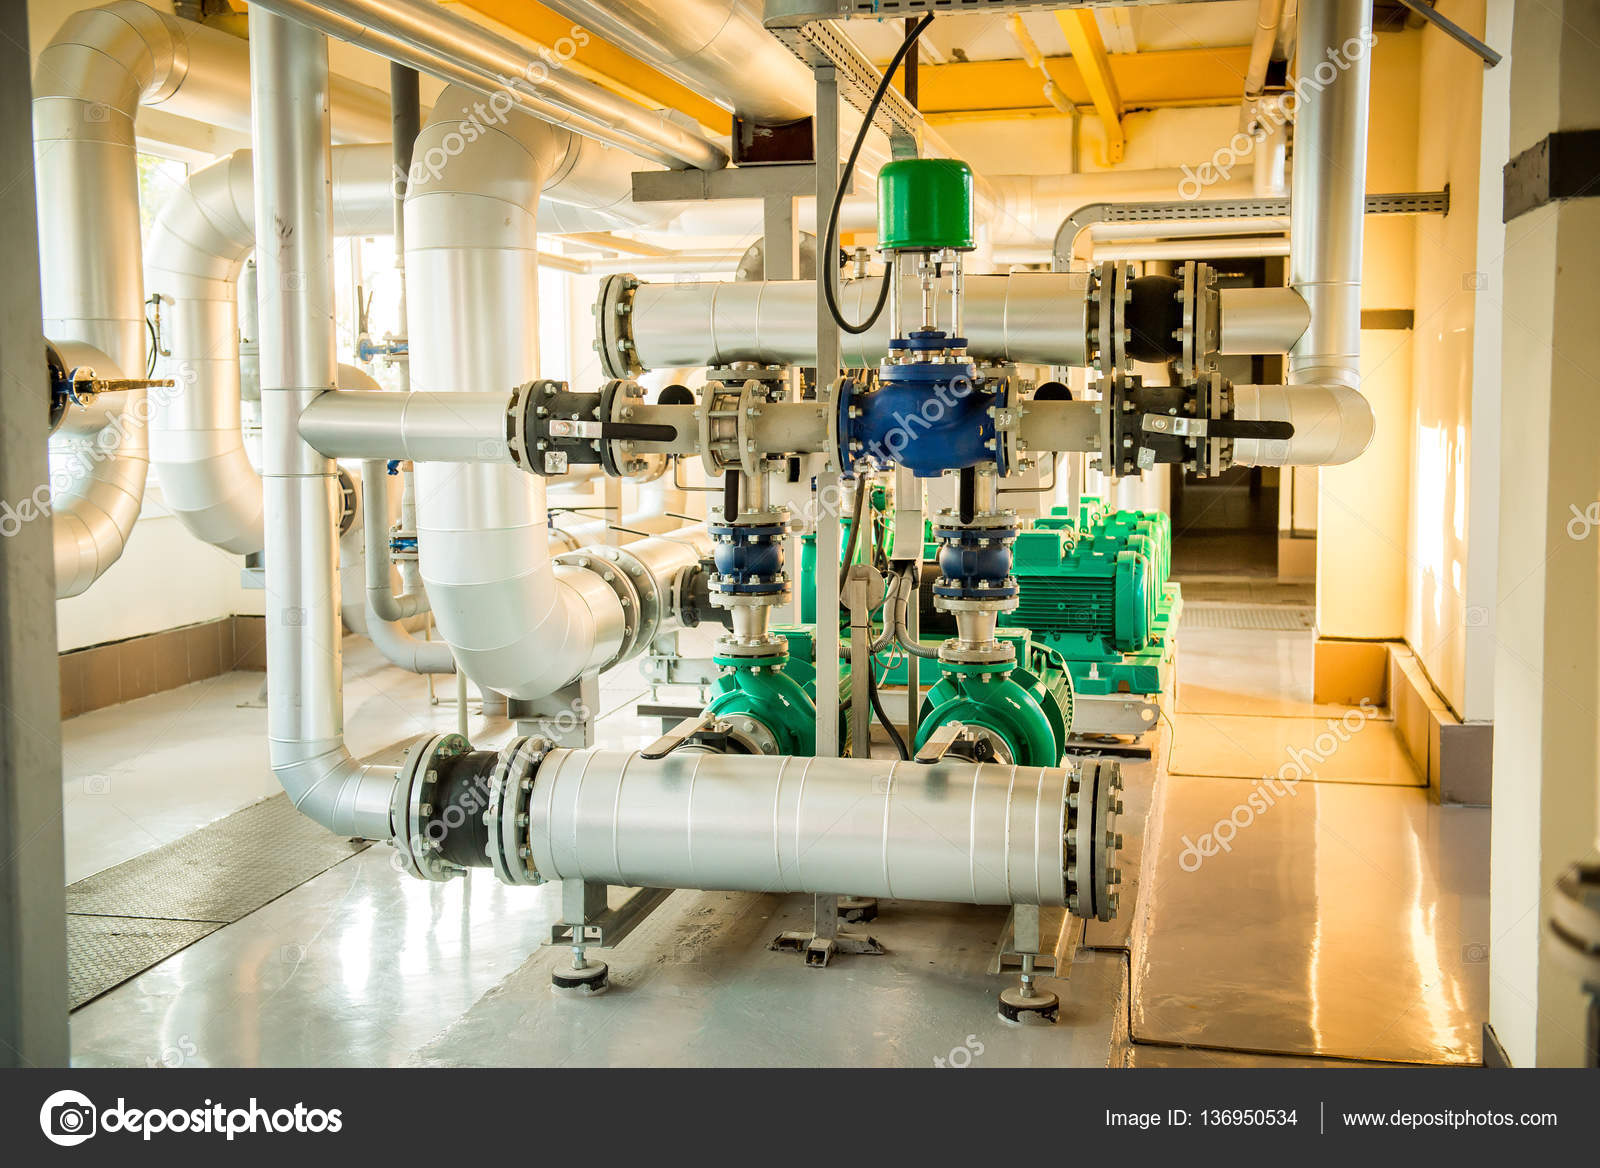 High Resolution Boiler Room Image